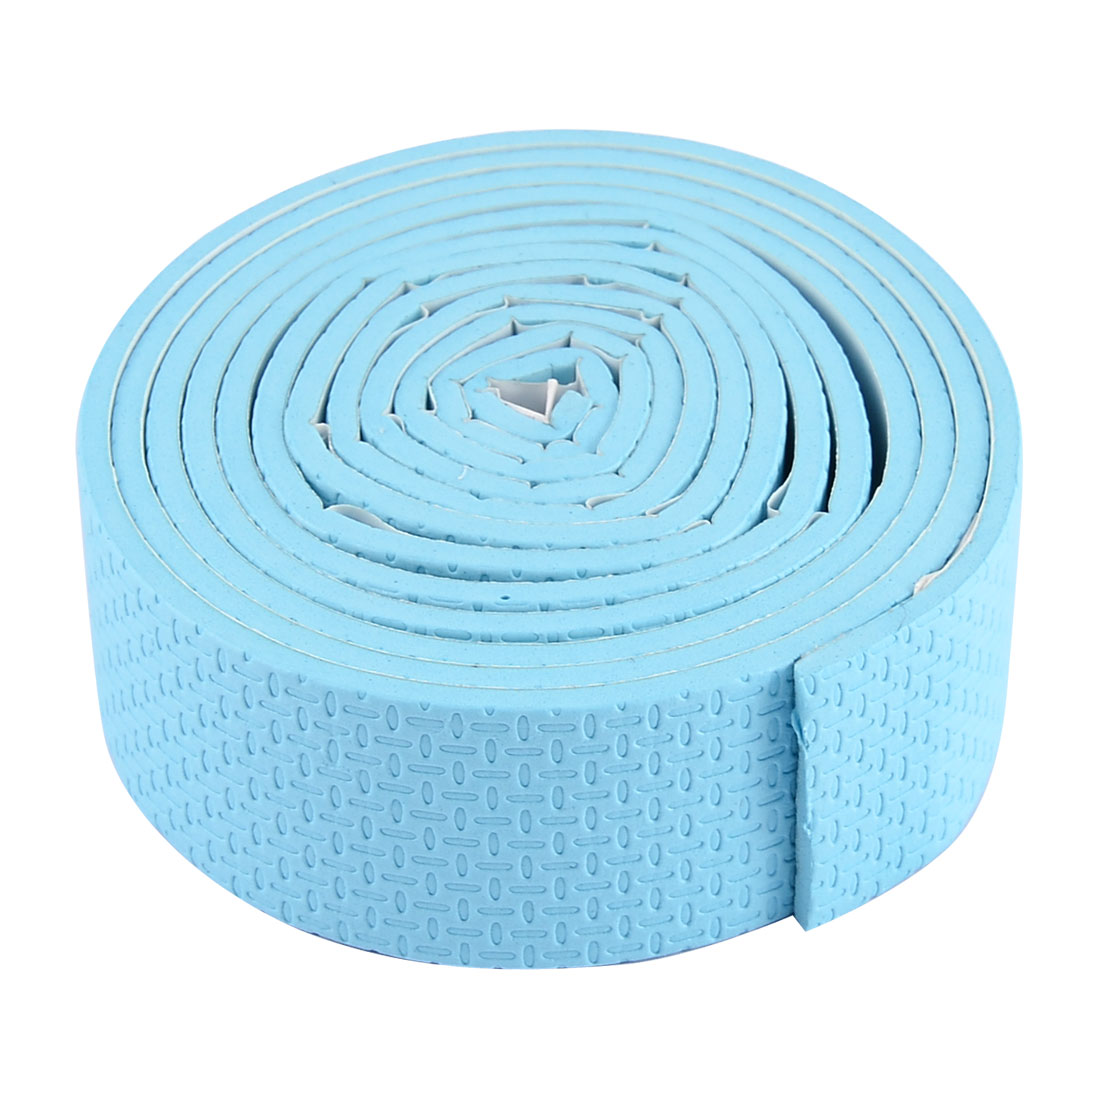 Self Adhesive Bumper Strip Surface Protector Corner Edge Cushion Guard